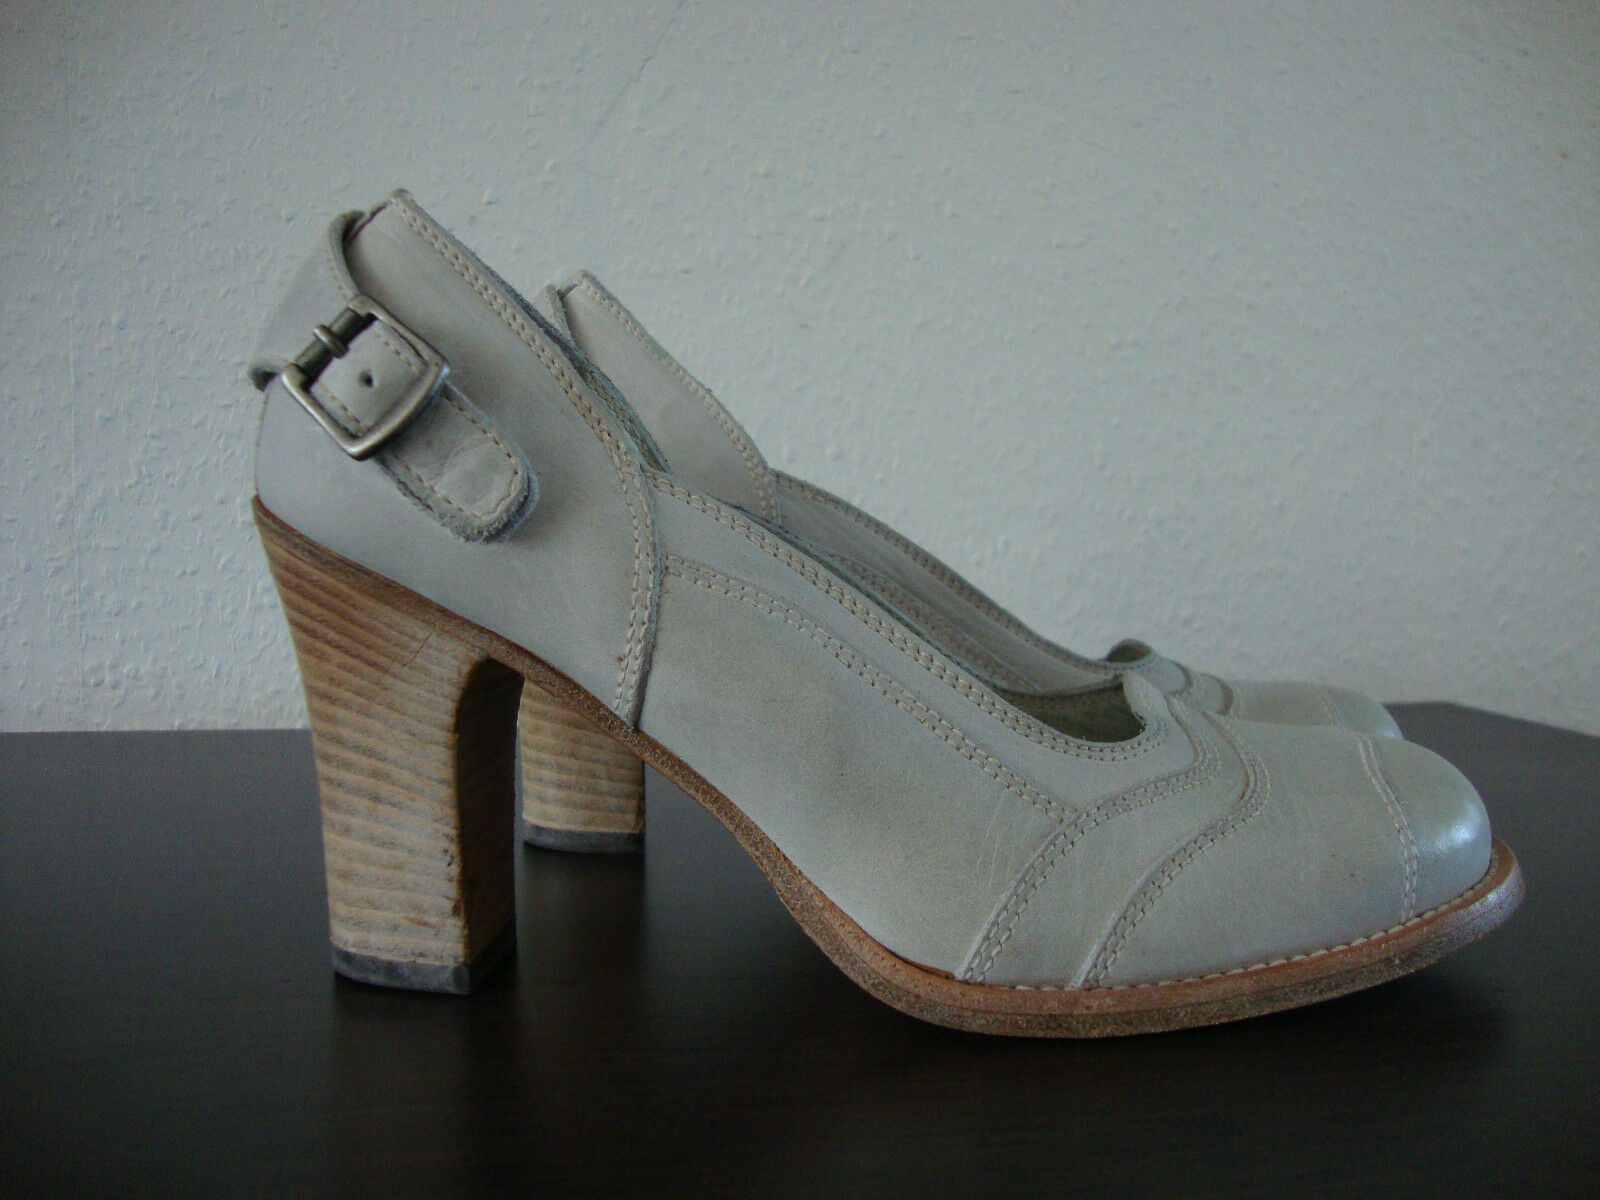 BELSTAFF Audrey lady Scarpe Scarpe Décolleté da 37 Donna in Pelle Antico Bianco Tg. 37 da NUOVO f7bf75